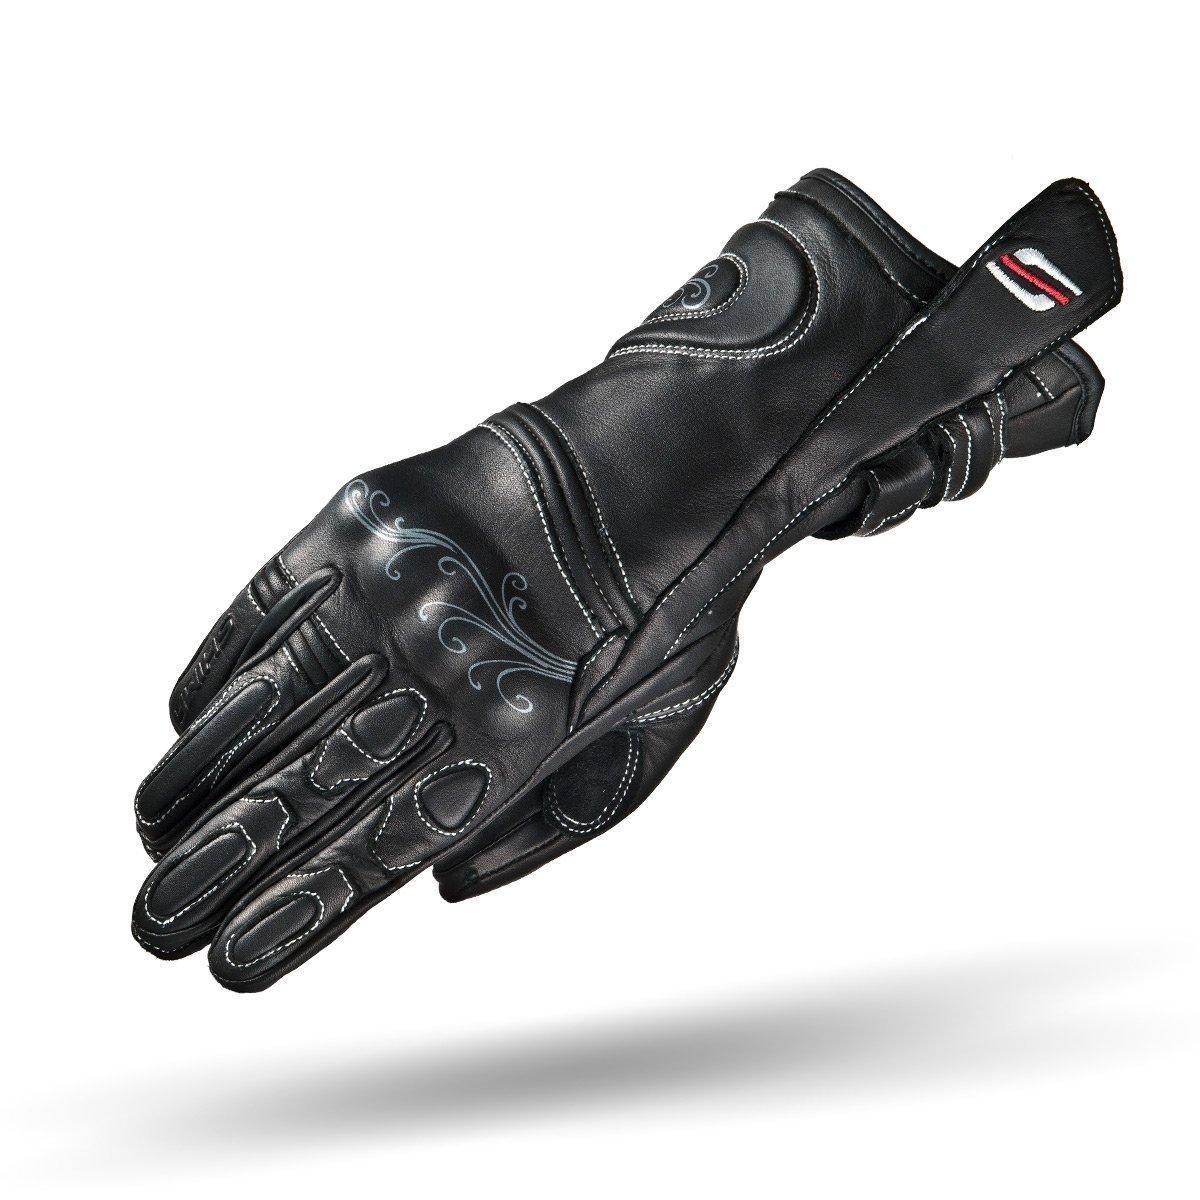 SHIMA Modena, Summer LeatherSoft Sport Stylish Women Lady Fit Motorcycle Gloves (XS-L) (S, Black)